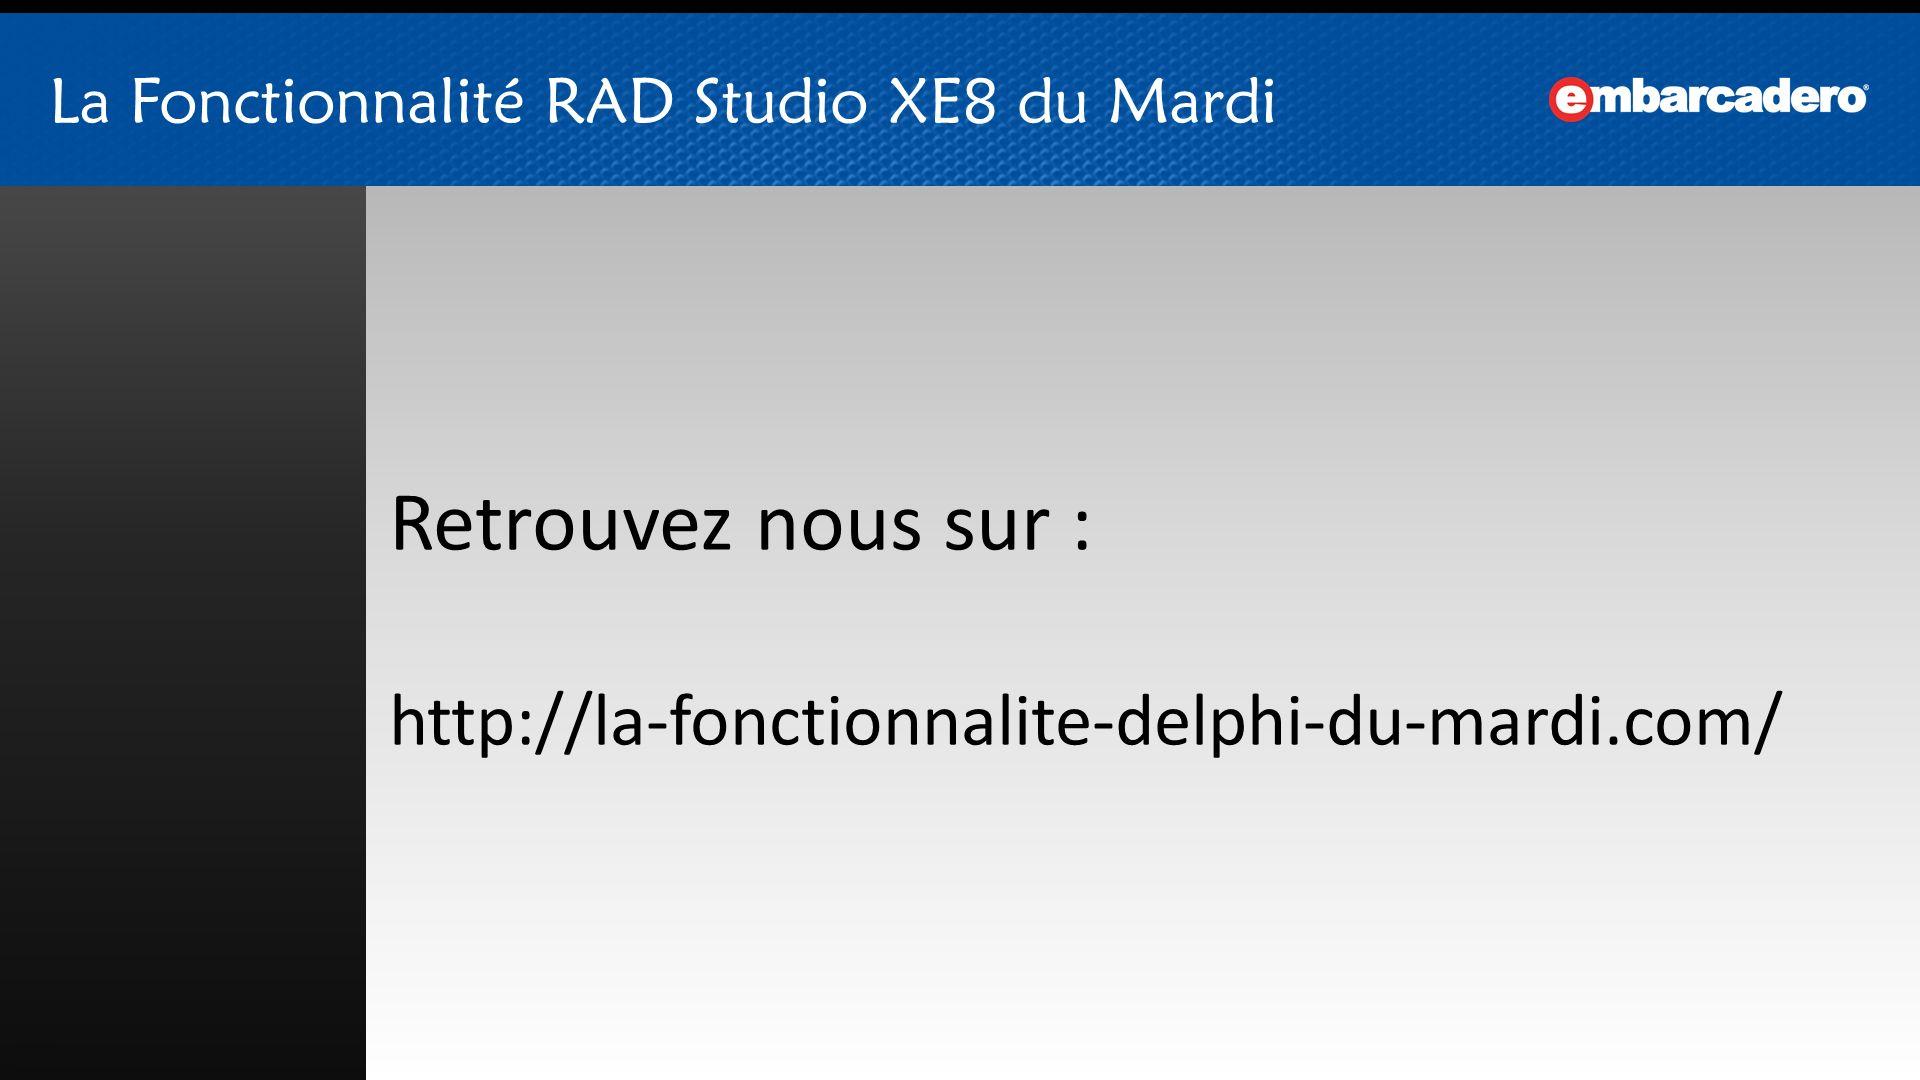 La Fonctionnalité Delphi XE8 du Mardi